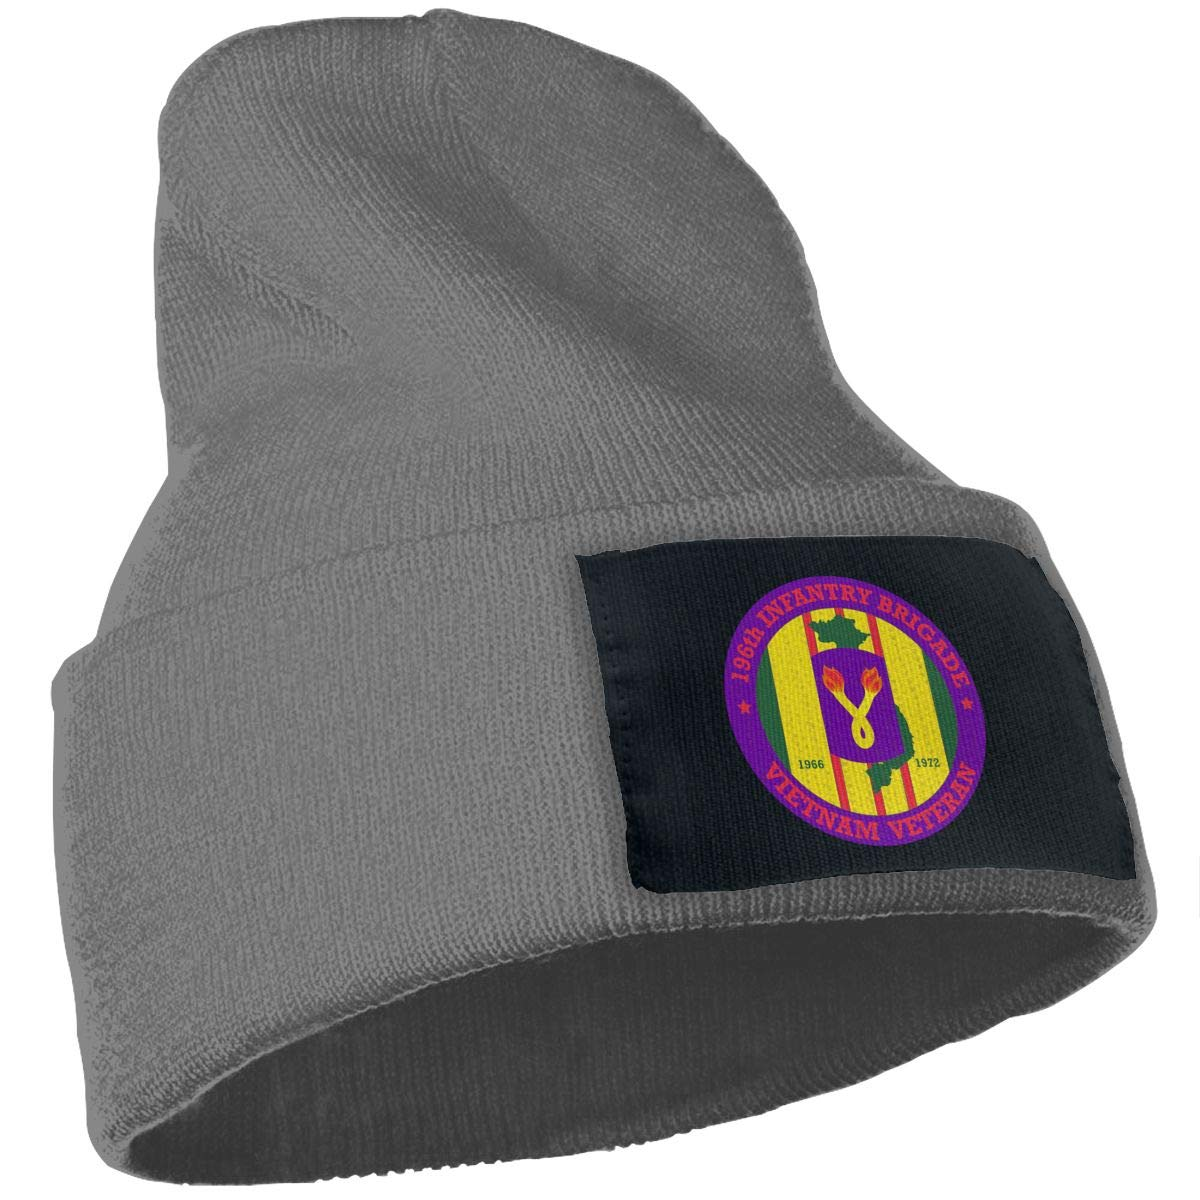 196th Light Infantry Brigade Vietnam Veteran Winter Warm Hats,Knit Slouchy Thick Skull Cap Black